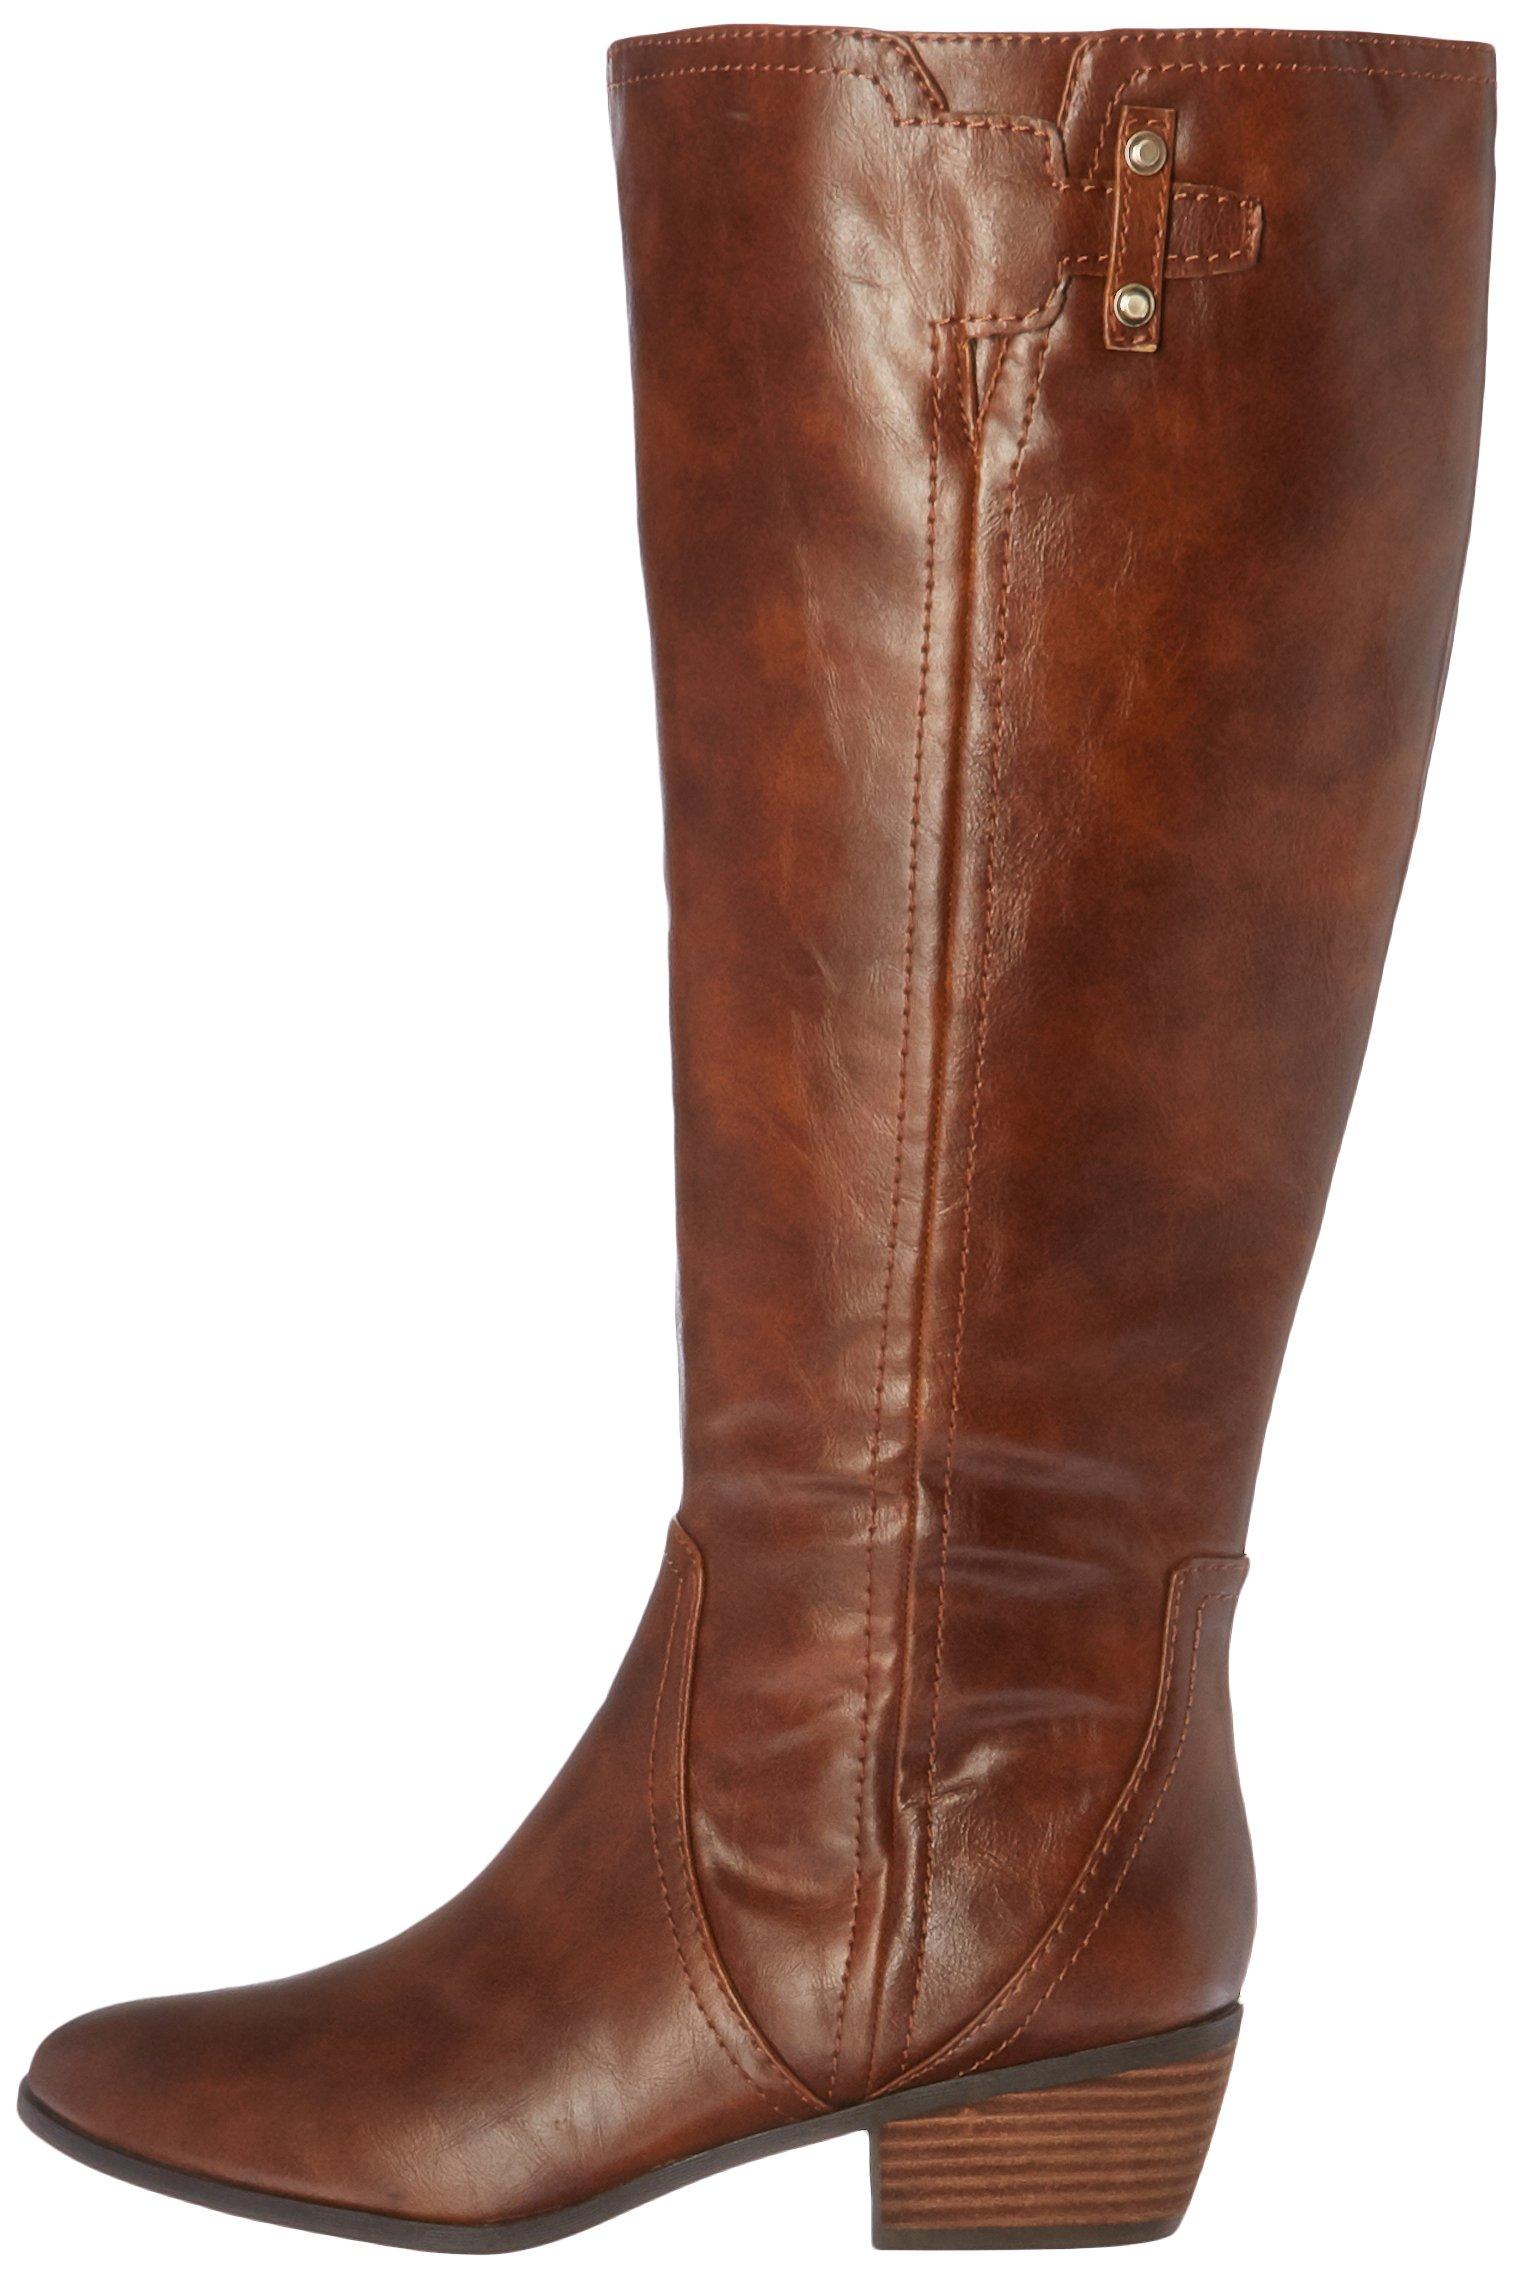 Dr. Scholl's Women's Brilliance Wide Calf Riding Boot